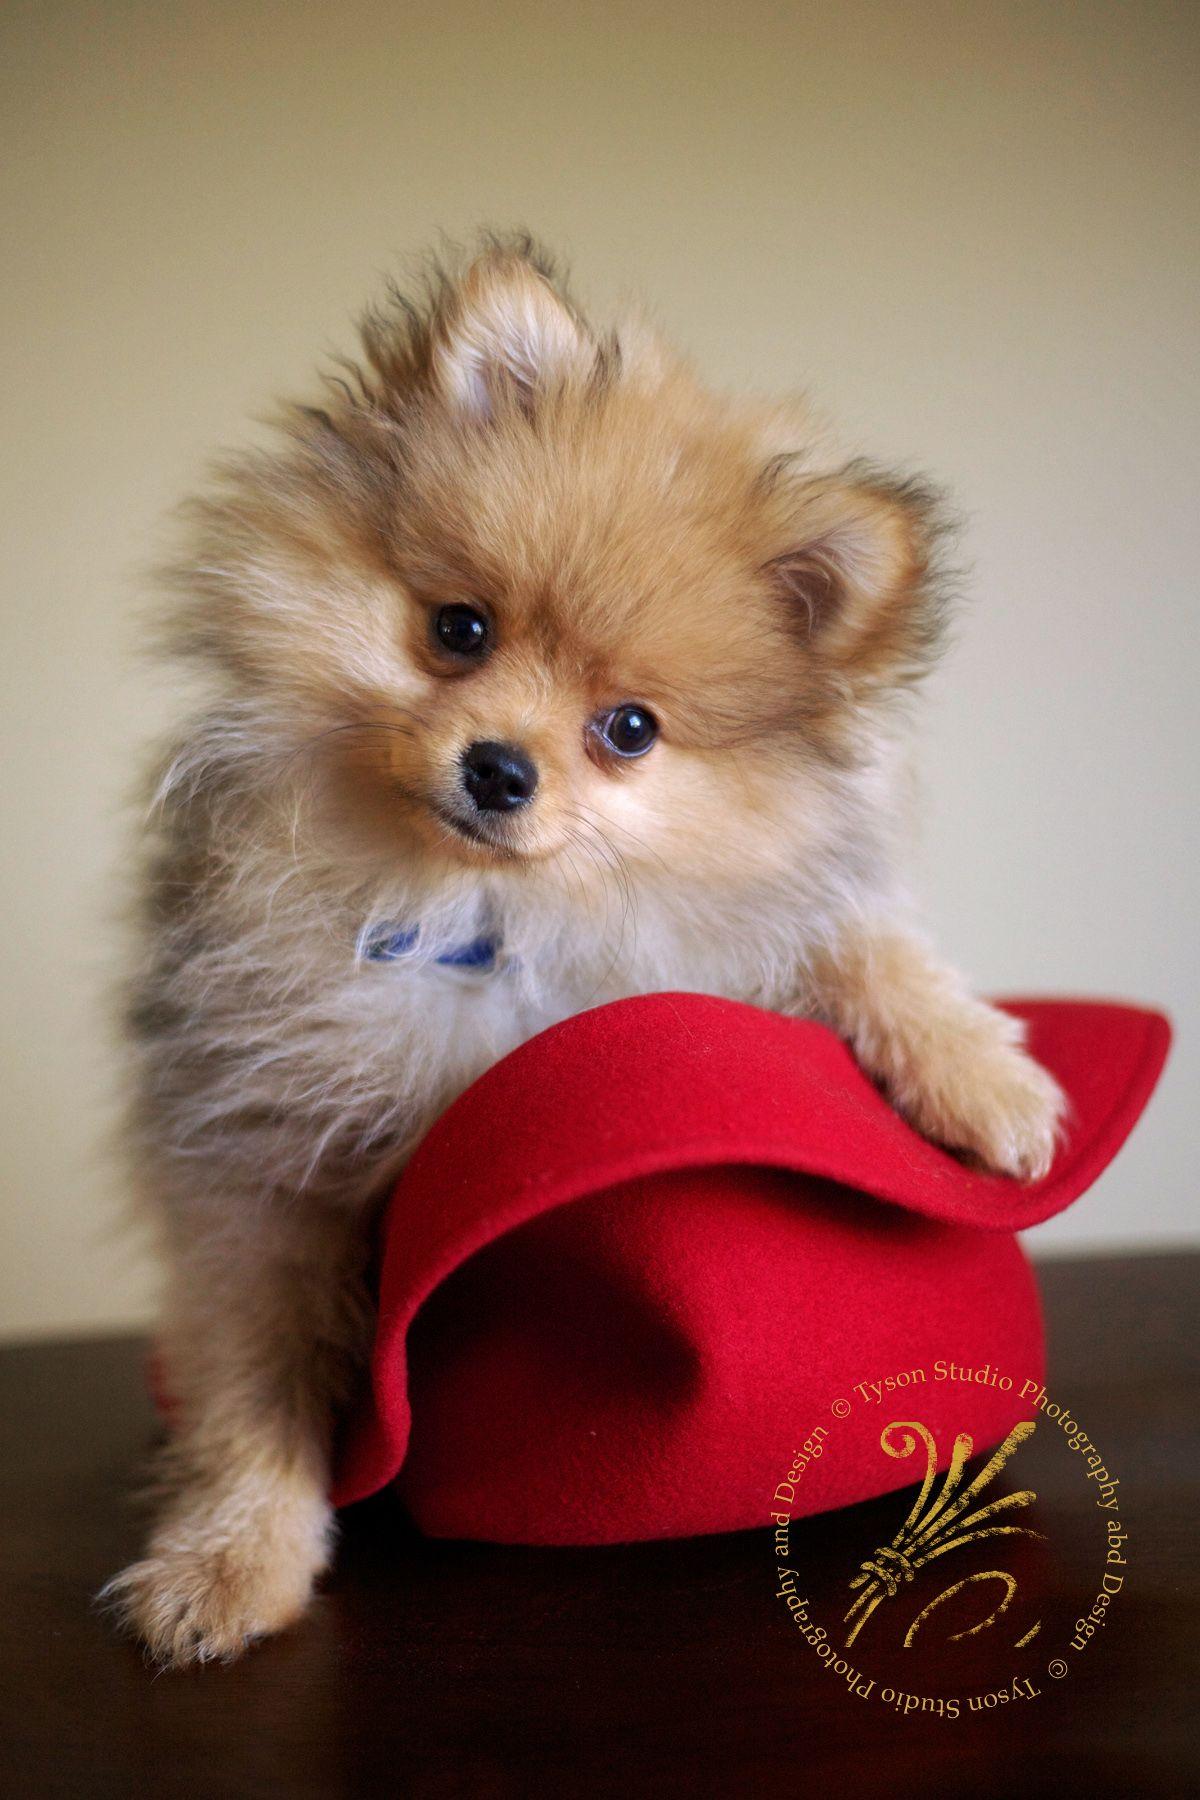 pomeranian puppy in red hat | Animals | Pinterest | Red ...